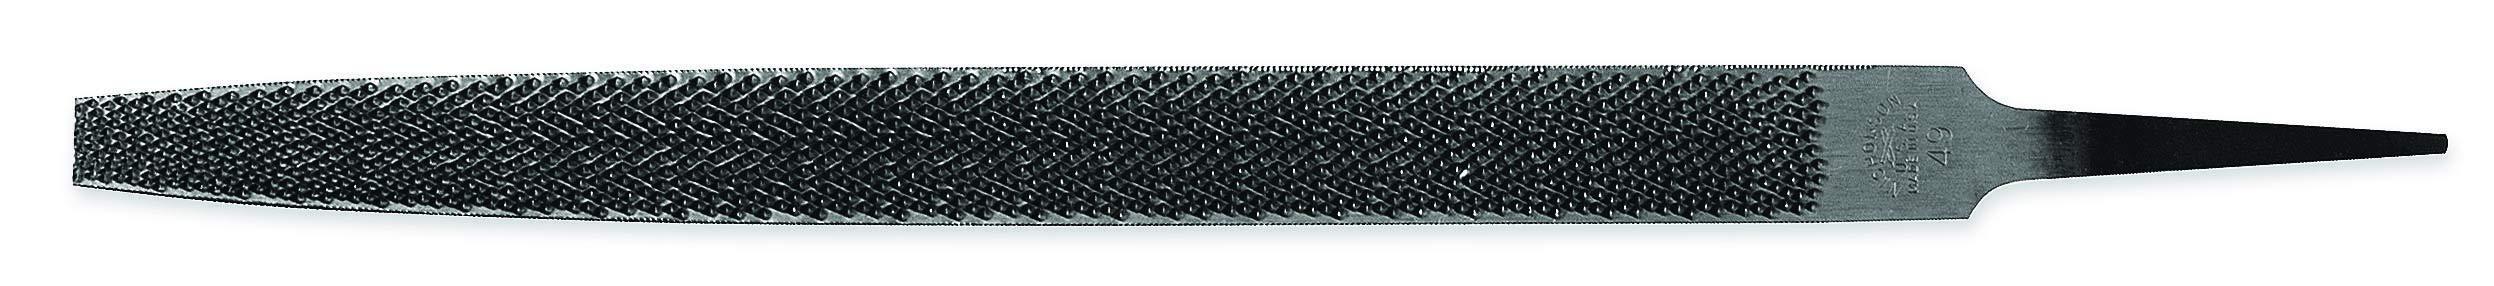 Nicholson 18861N 10'' Pattern Maker Cabinet Rasp, Smooth Cut, No. 50 by Nicholson (Image #1)